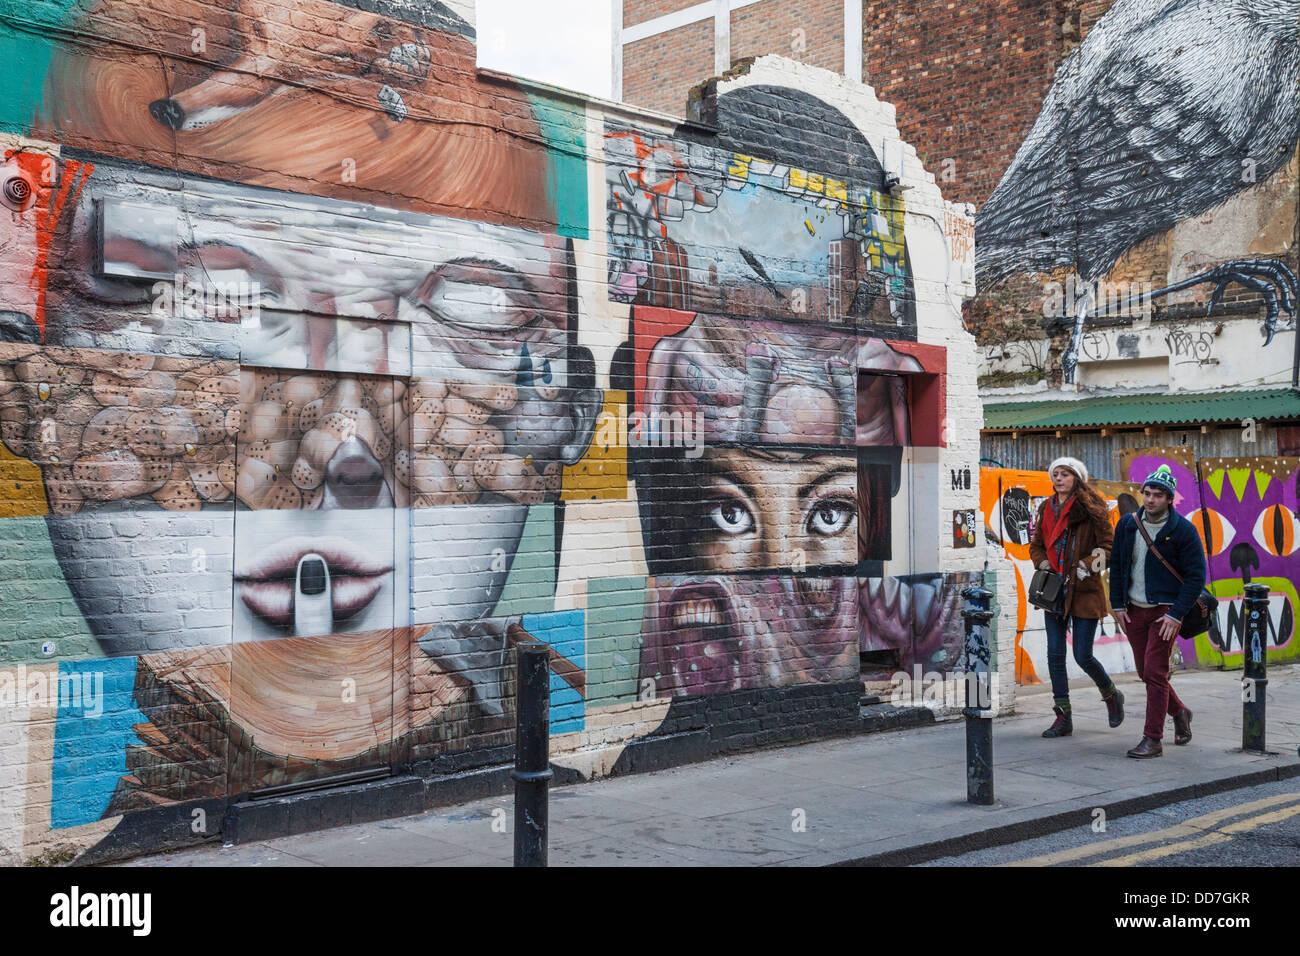 england london shoreditch brick lane wall mural stock photo england london shoreditch brick lane wall mural